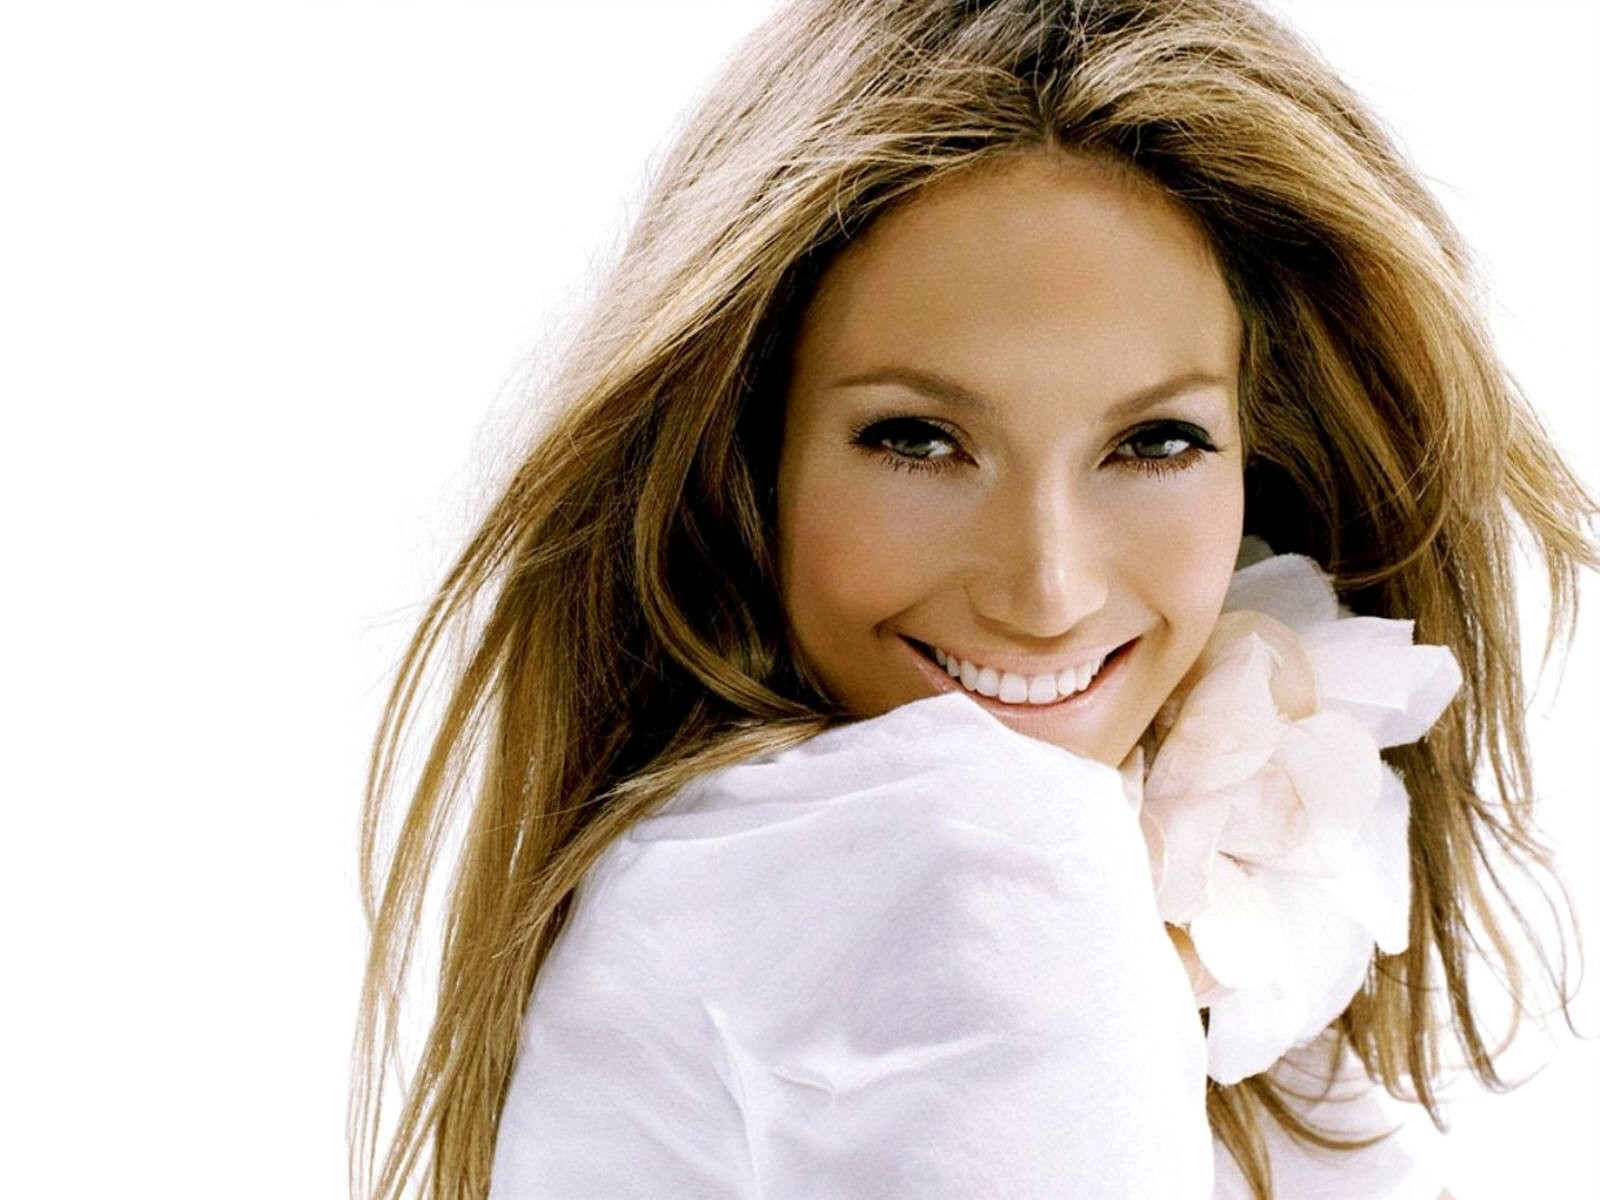 Wallpaper di Jennifer Lopez, diva del latin pop